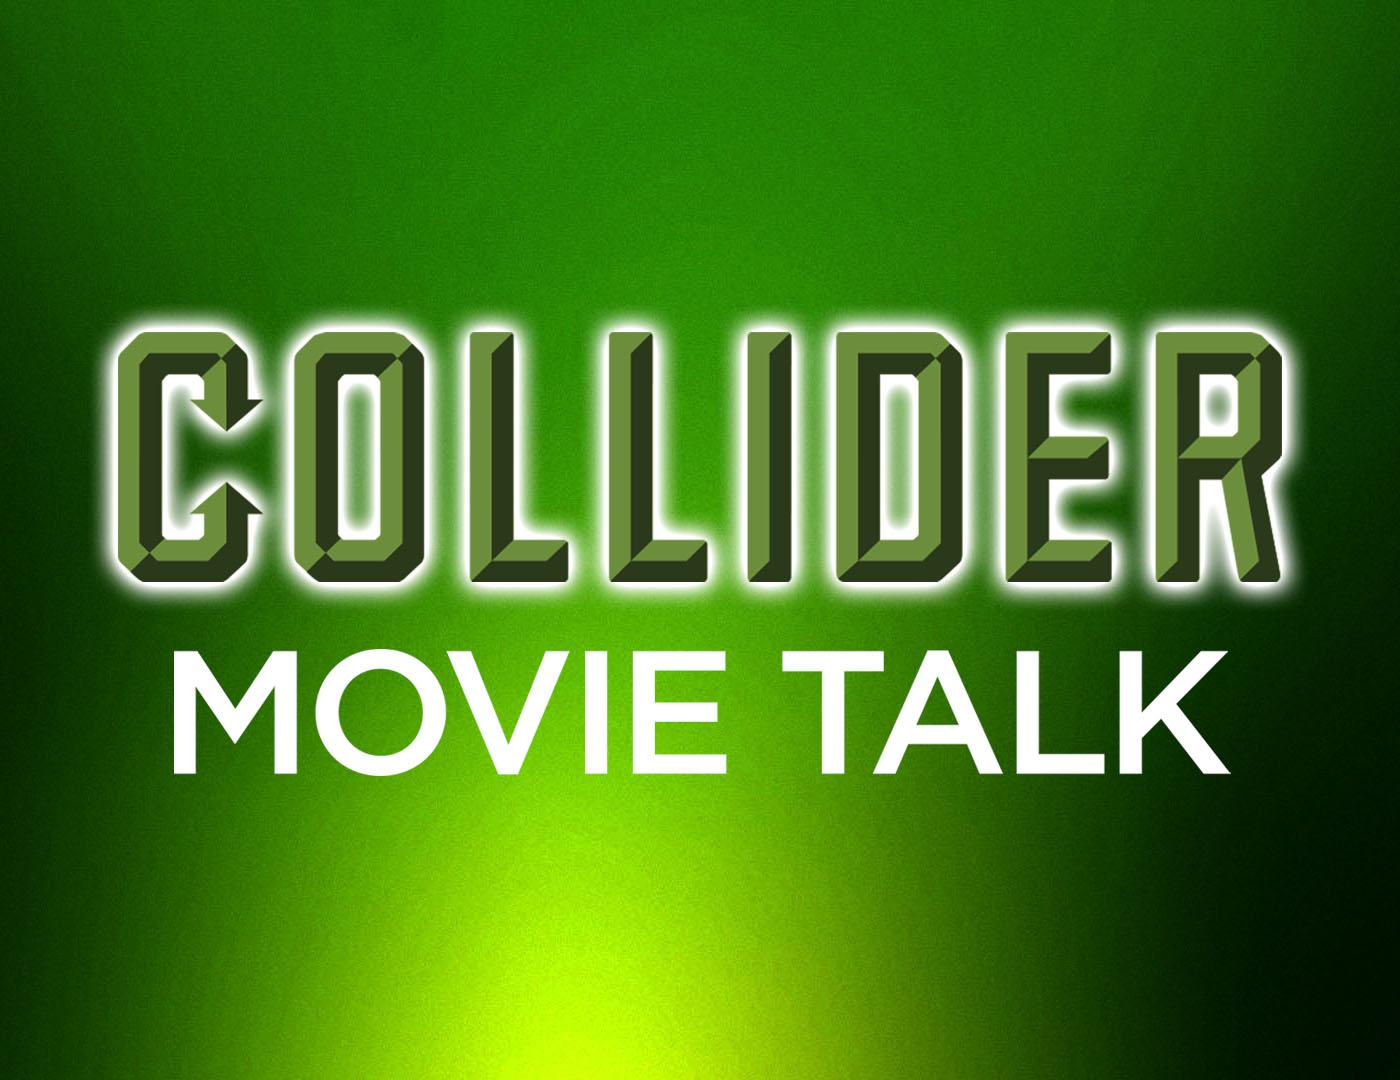 Collider Movie Talk - Spider-Man Coming To IMAX 3D, Batman V Superman Gets Nolan's Blessing